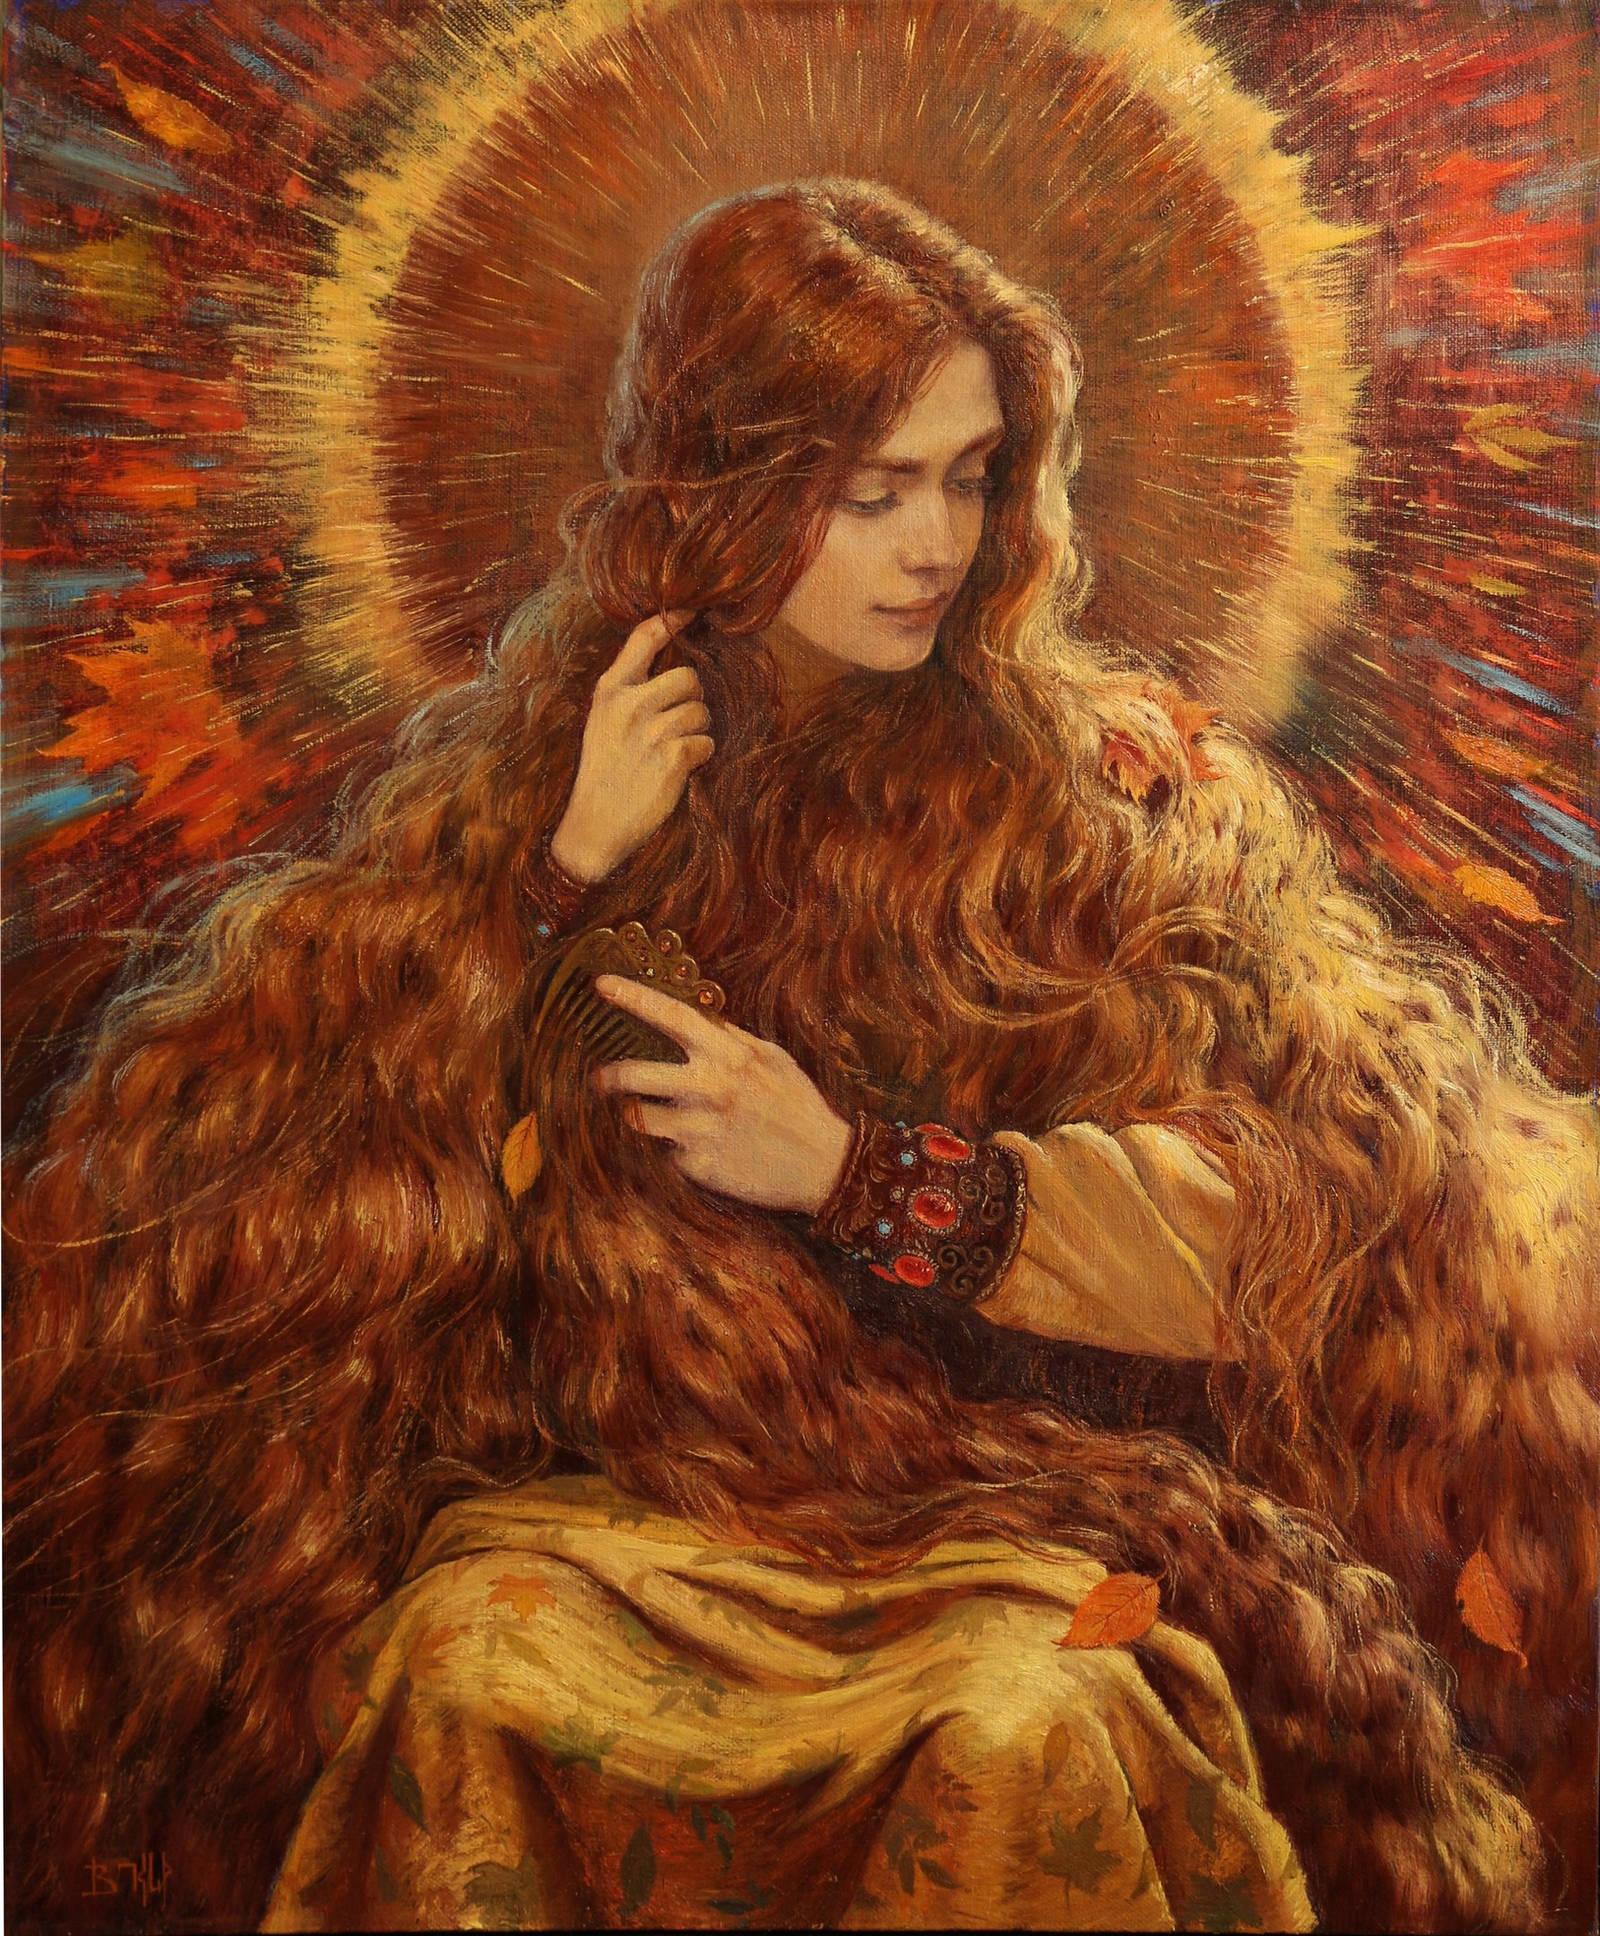 AUTUMN by Vladimir-Kireev